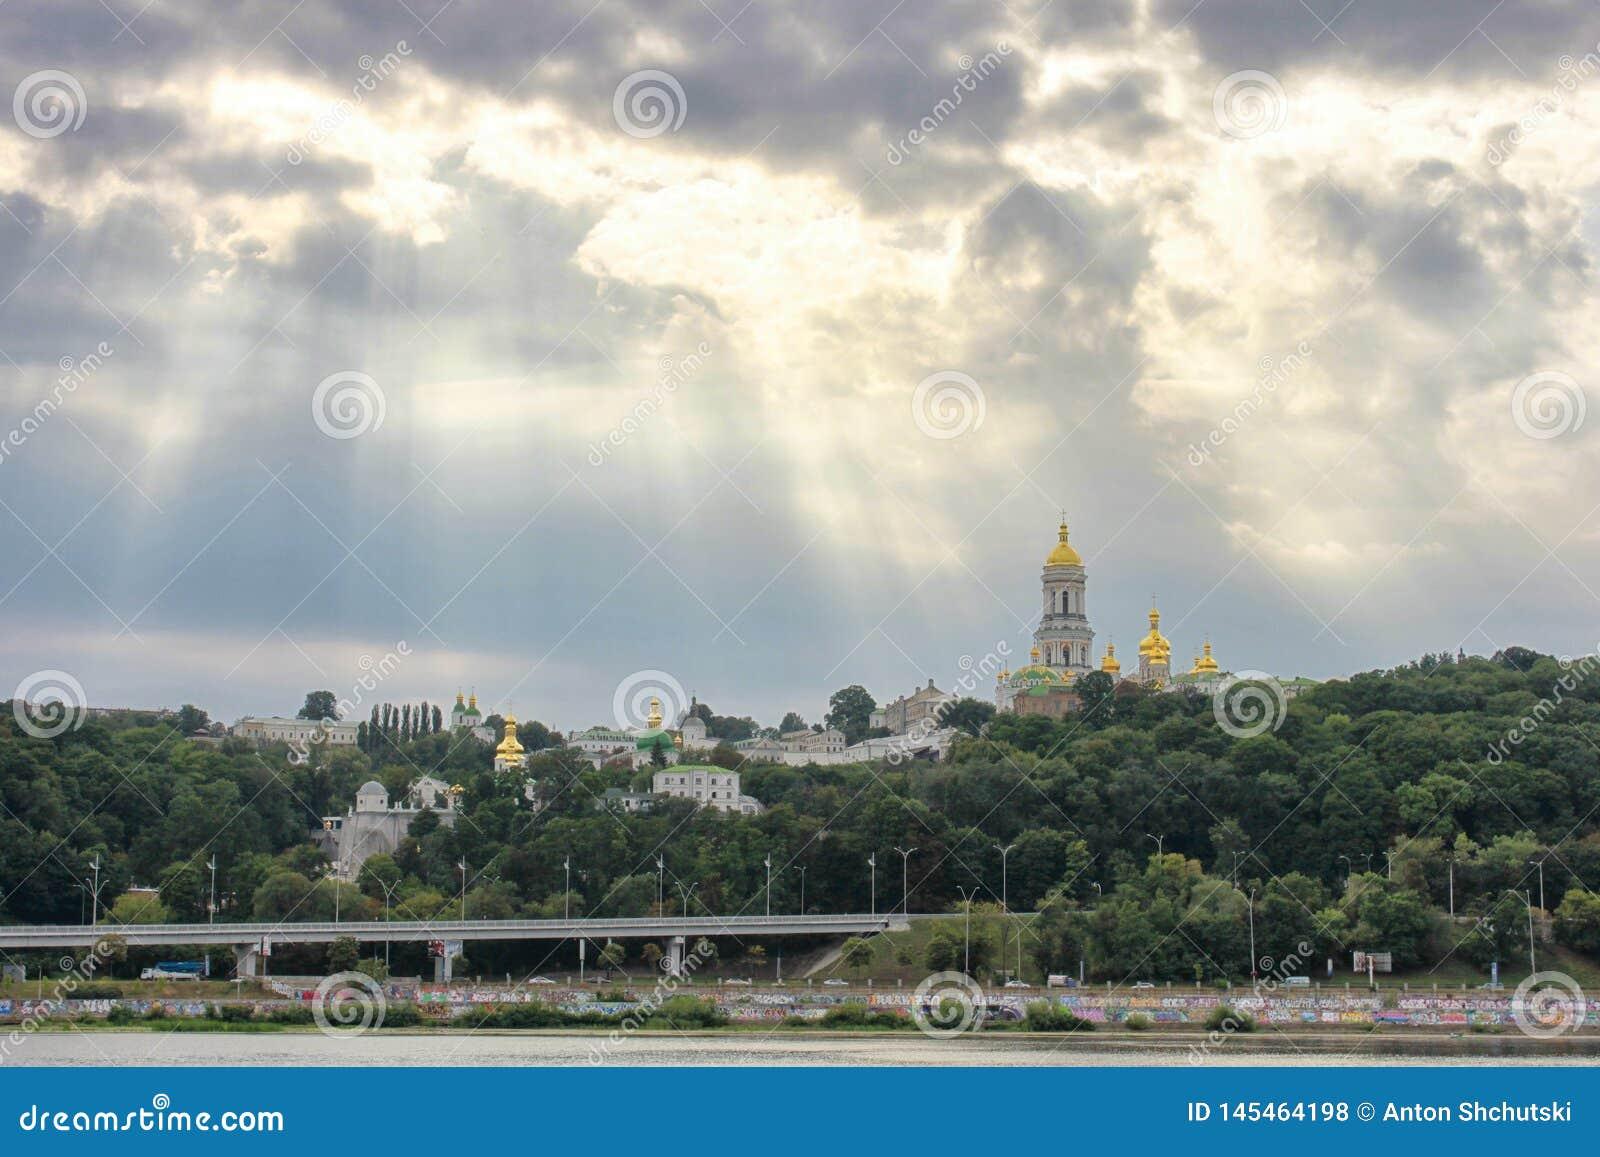 View of Kiev Pechersk Lavra and Dnepr river. Kiev, Ukraine